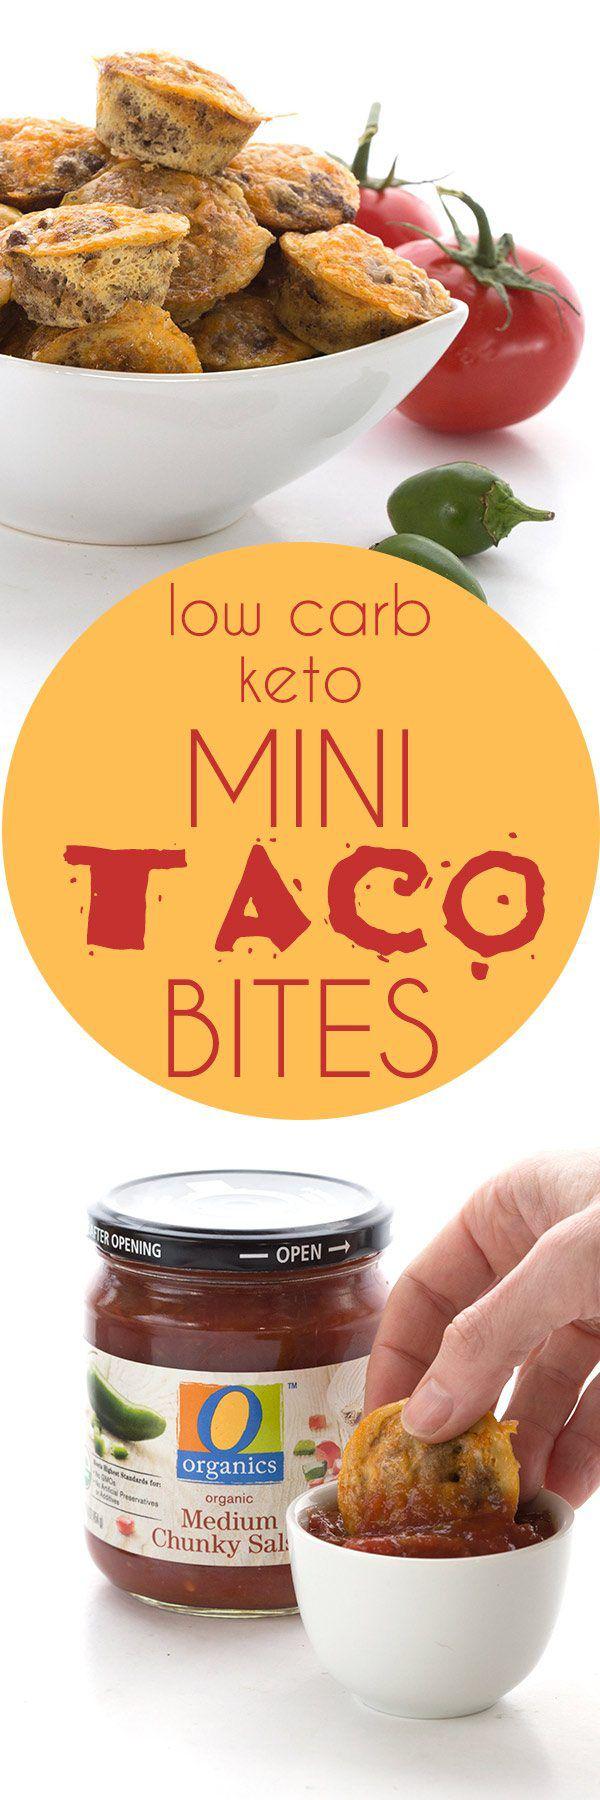 Mini Taco Bites via dreamaboutfood paleo diet macros